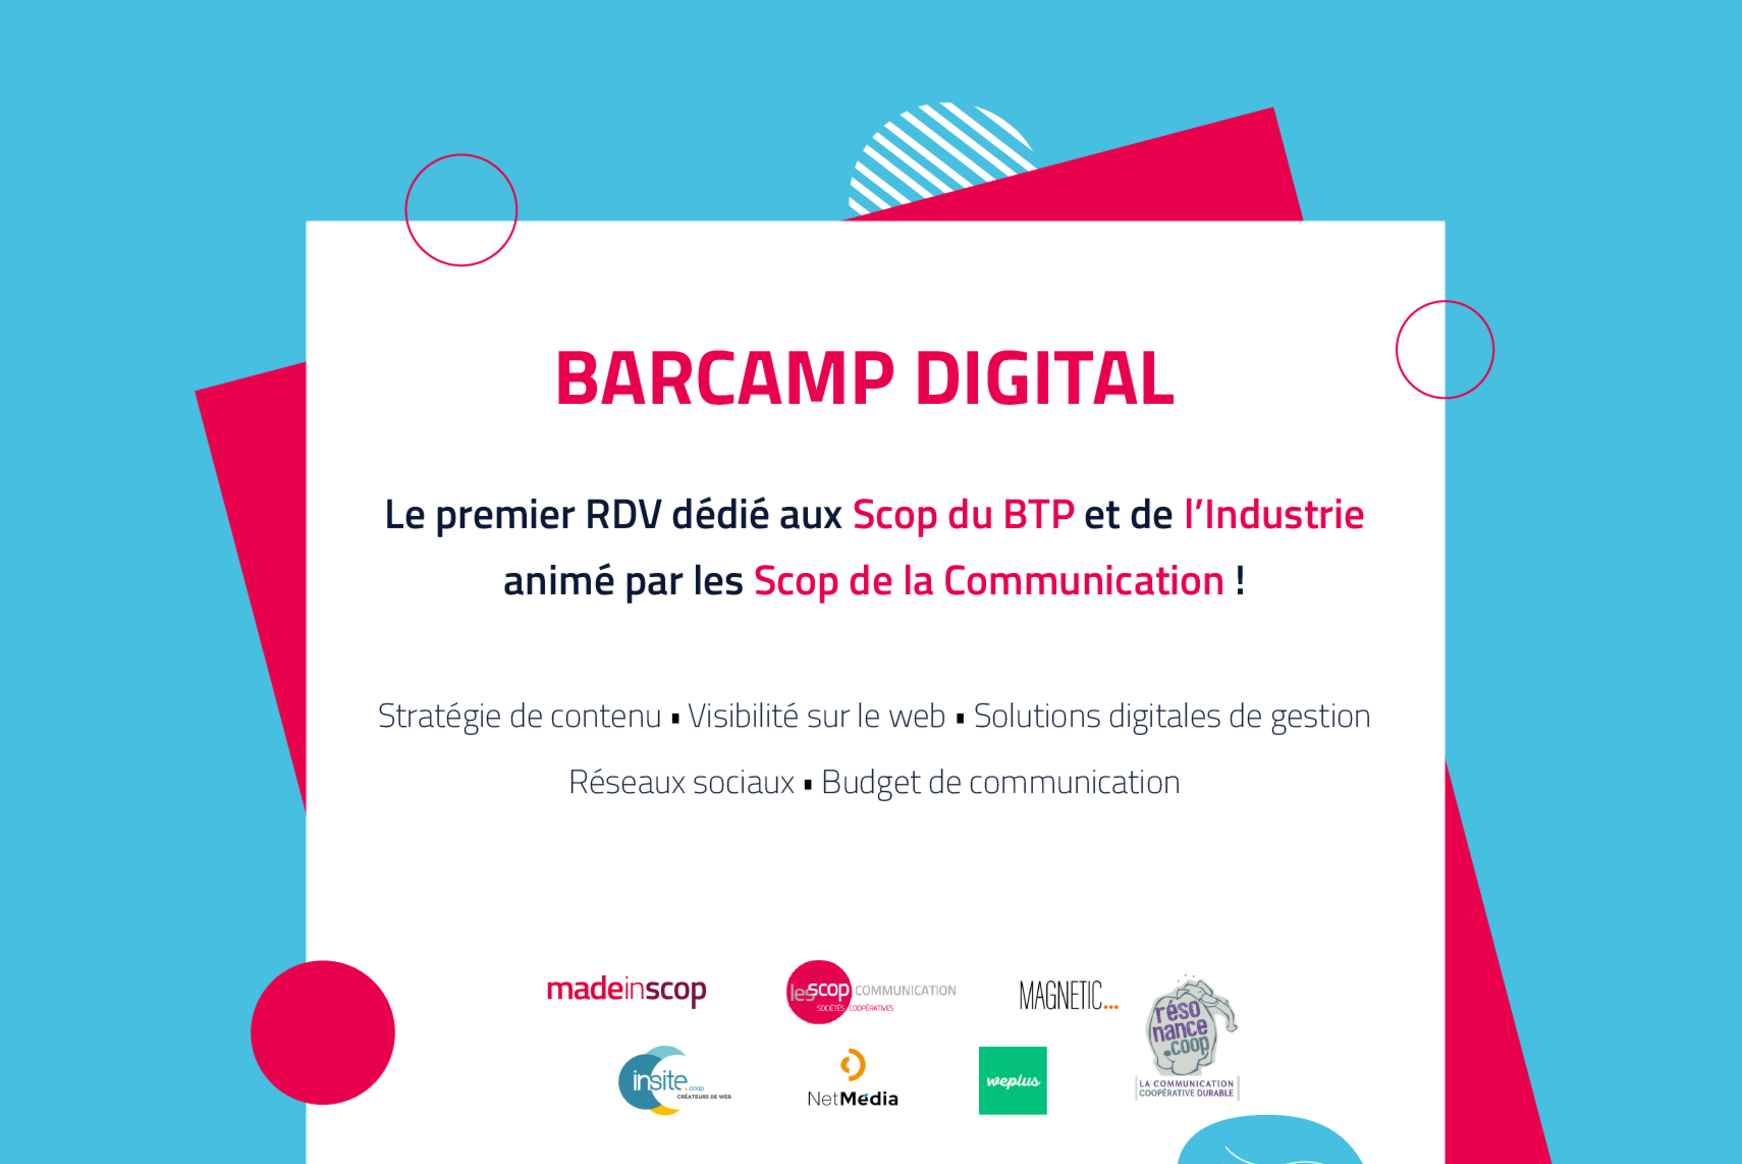 Barcamp digital !